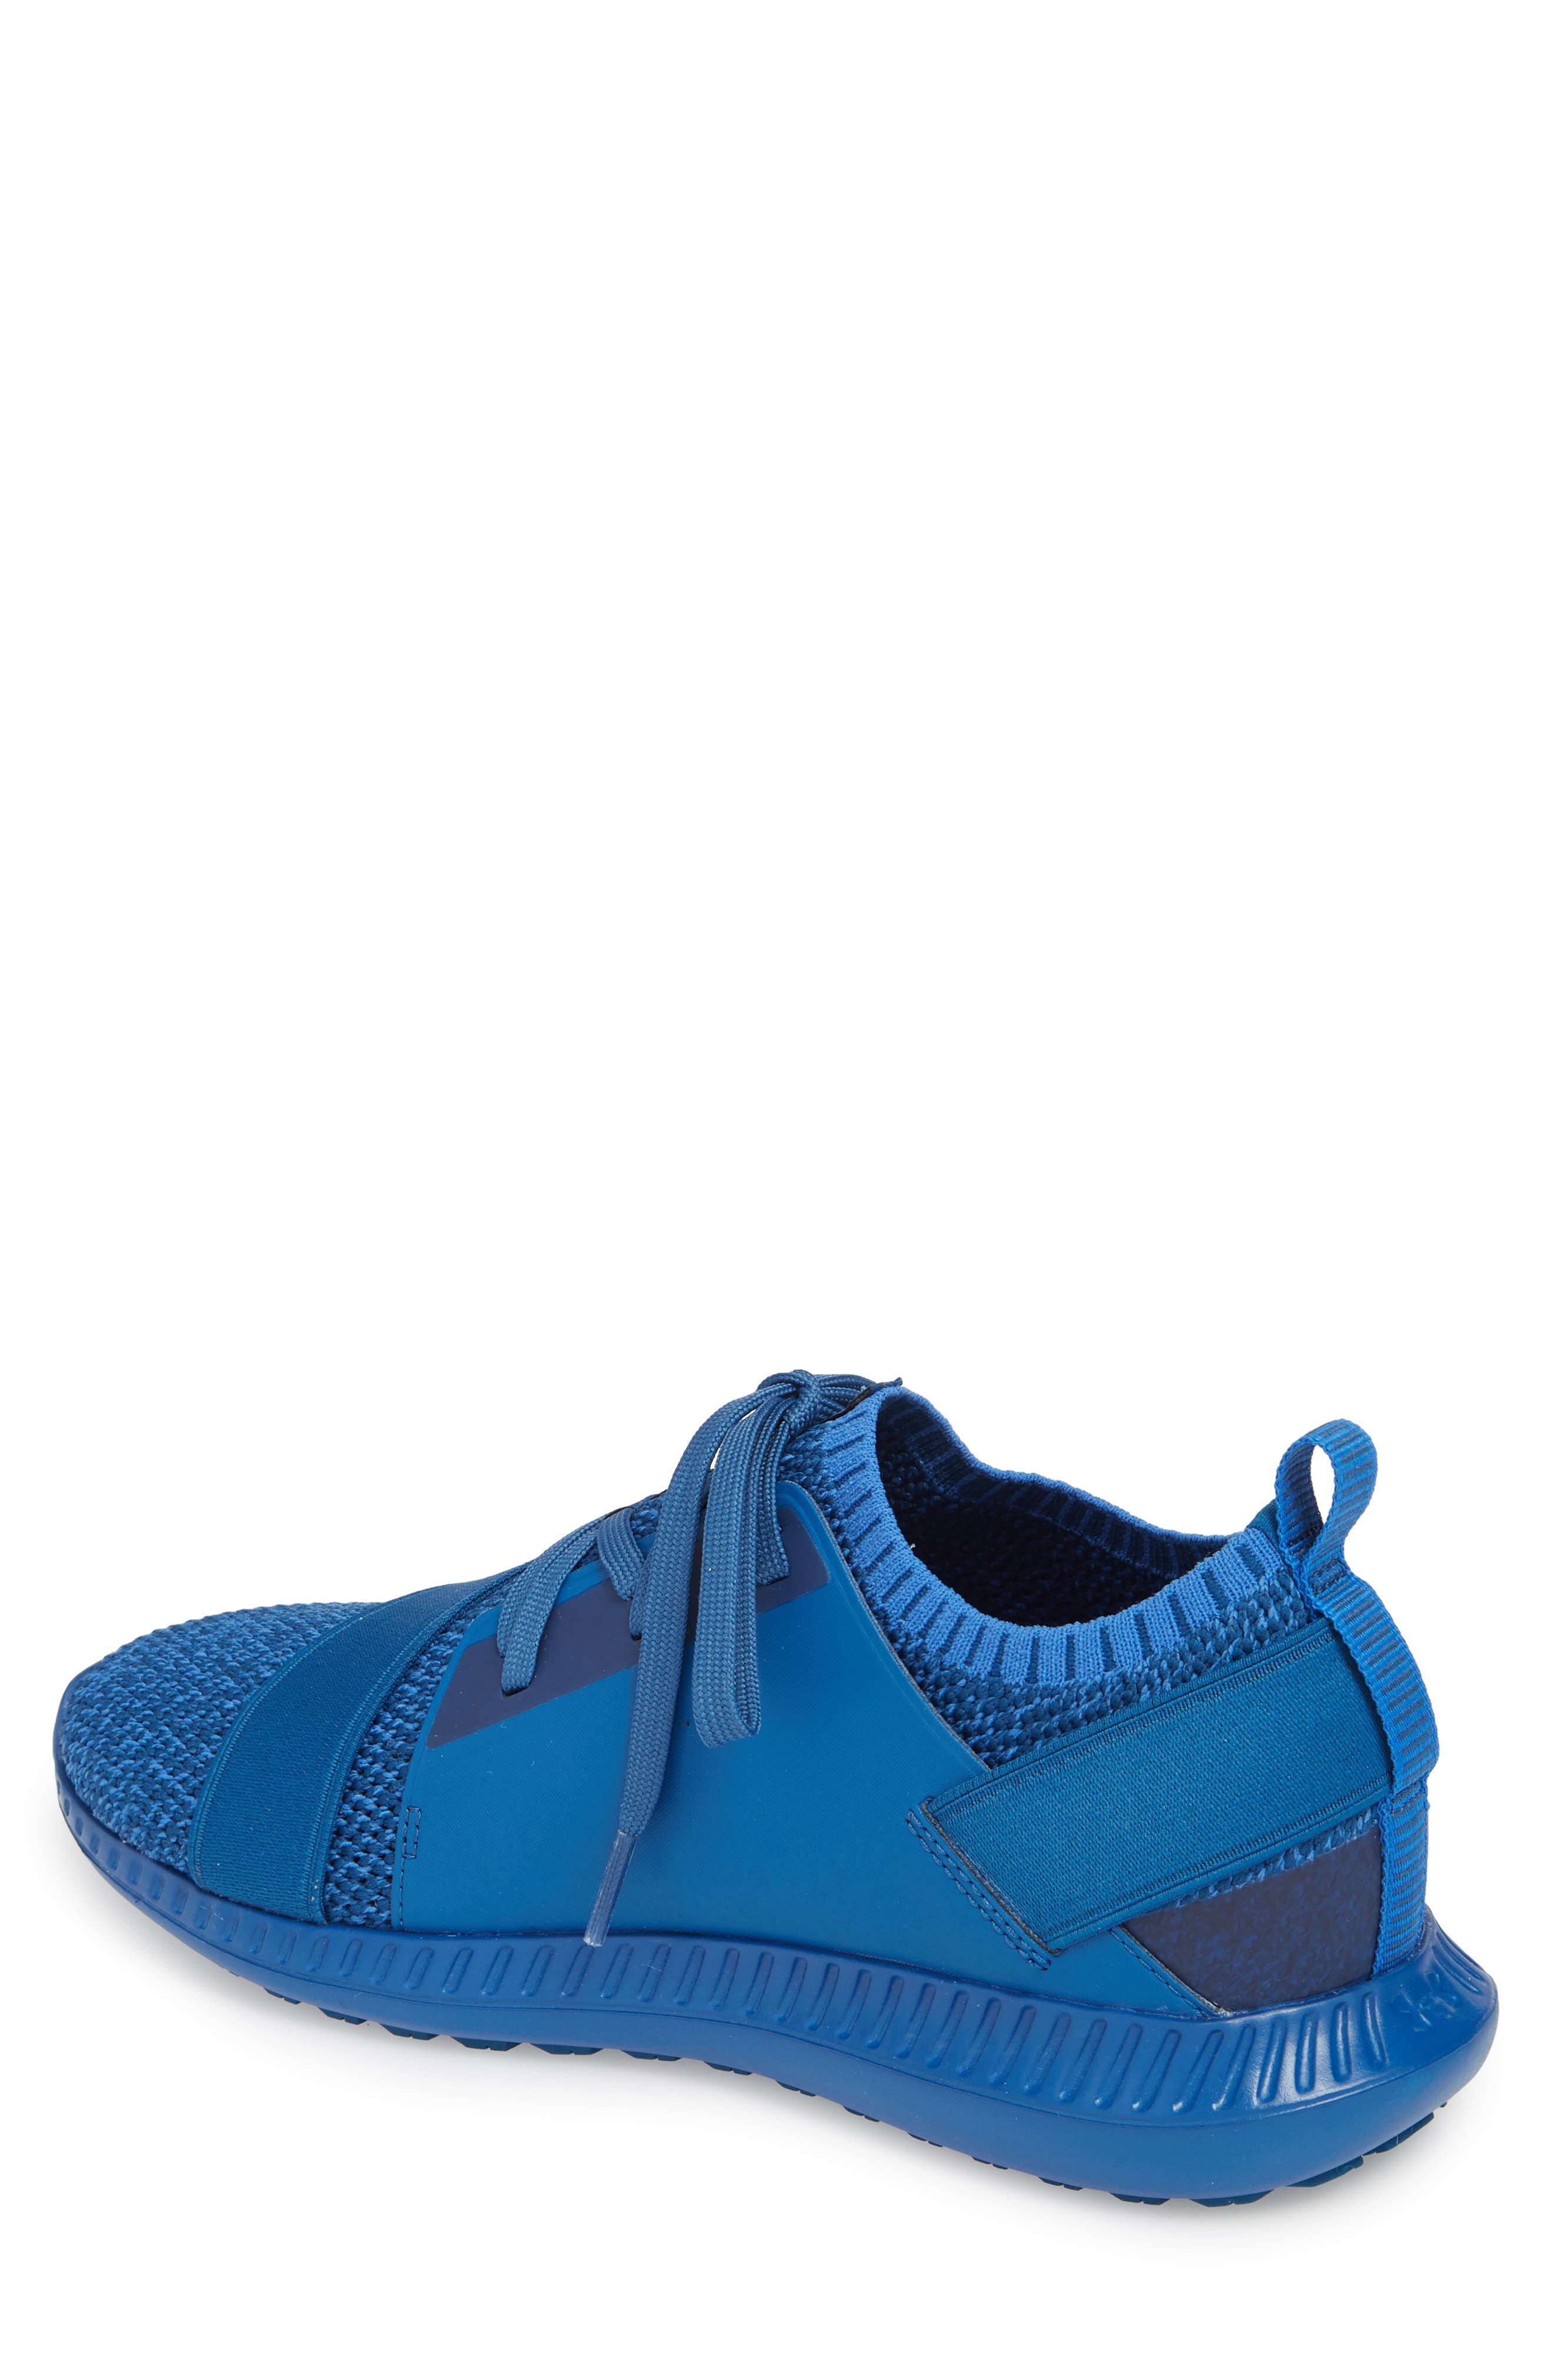 Threadborne Shift Sneaker,                             Alternate thumbnail 2, color,                             Blue / Mediterranean